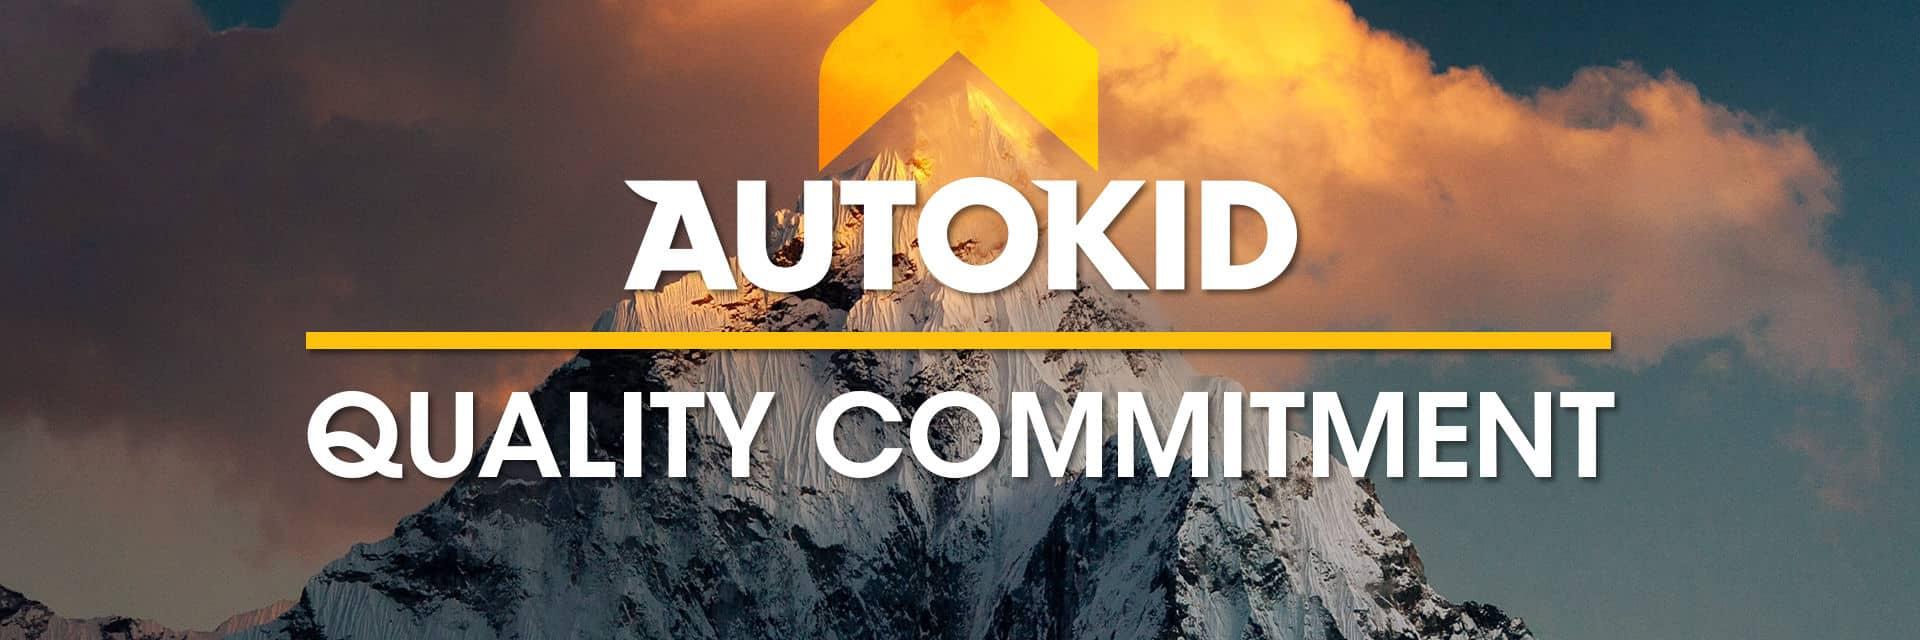 autokid quality commitment mobile